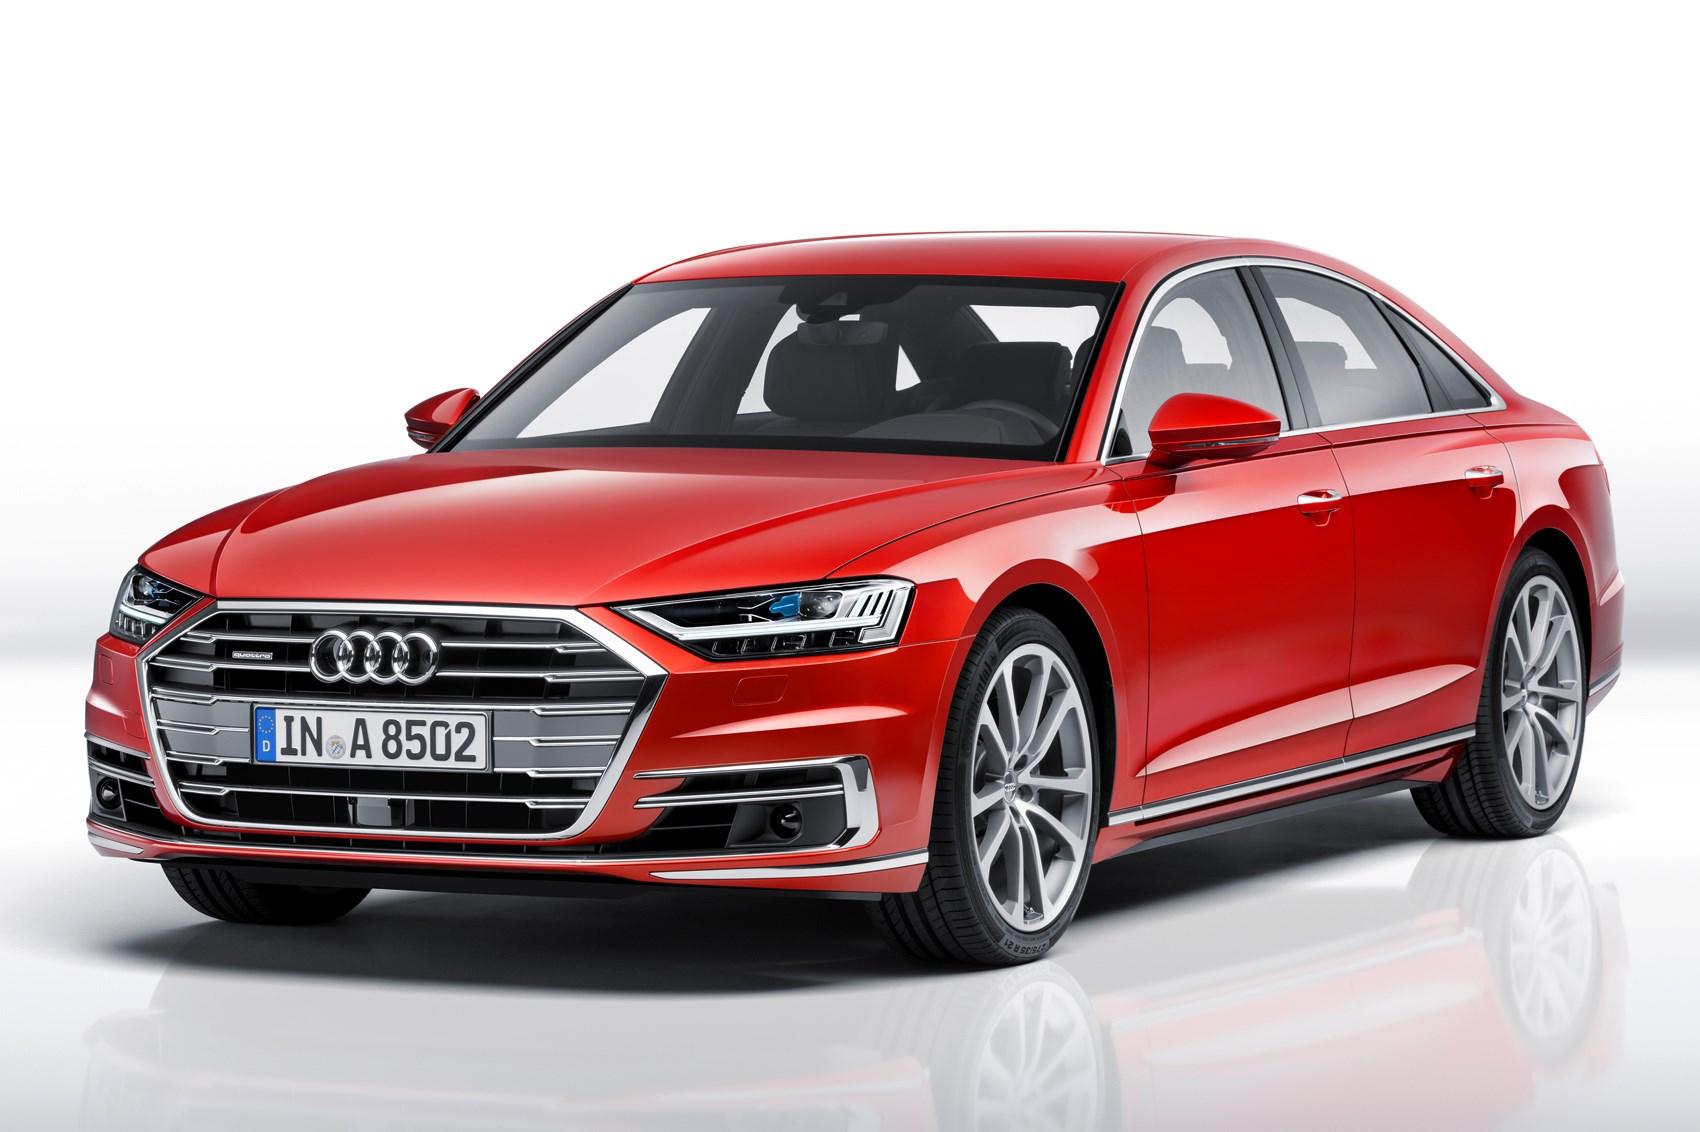 Audi a8 deals Sony xperia z best contract deals